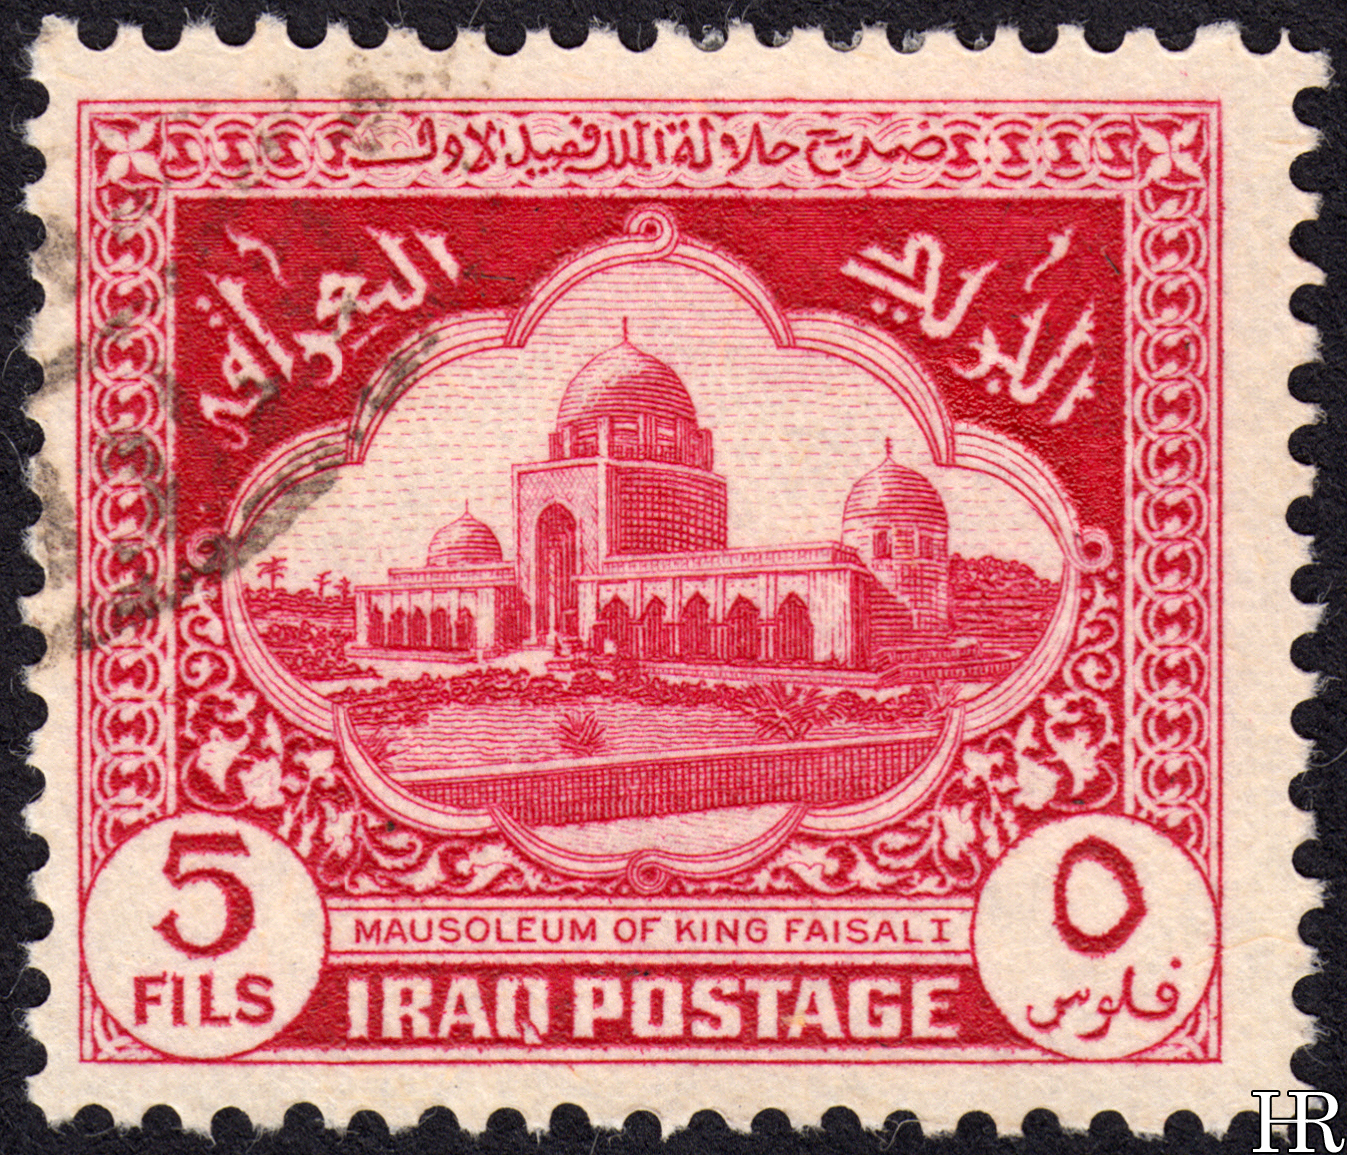 5 fils (1st January 1943)